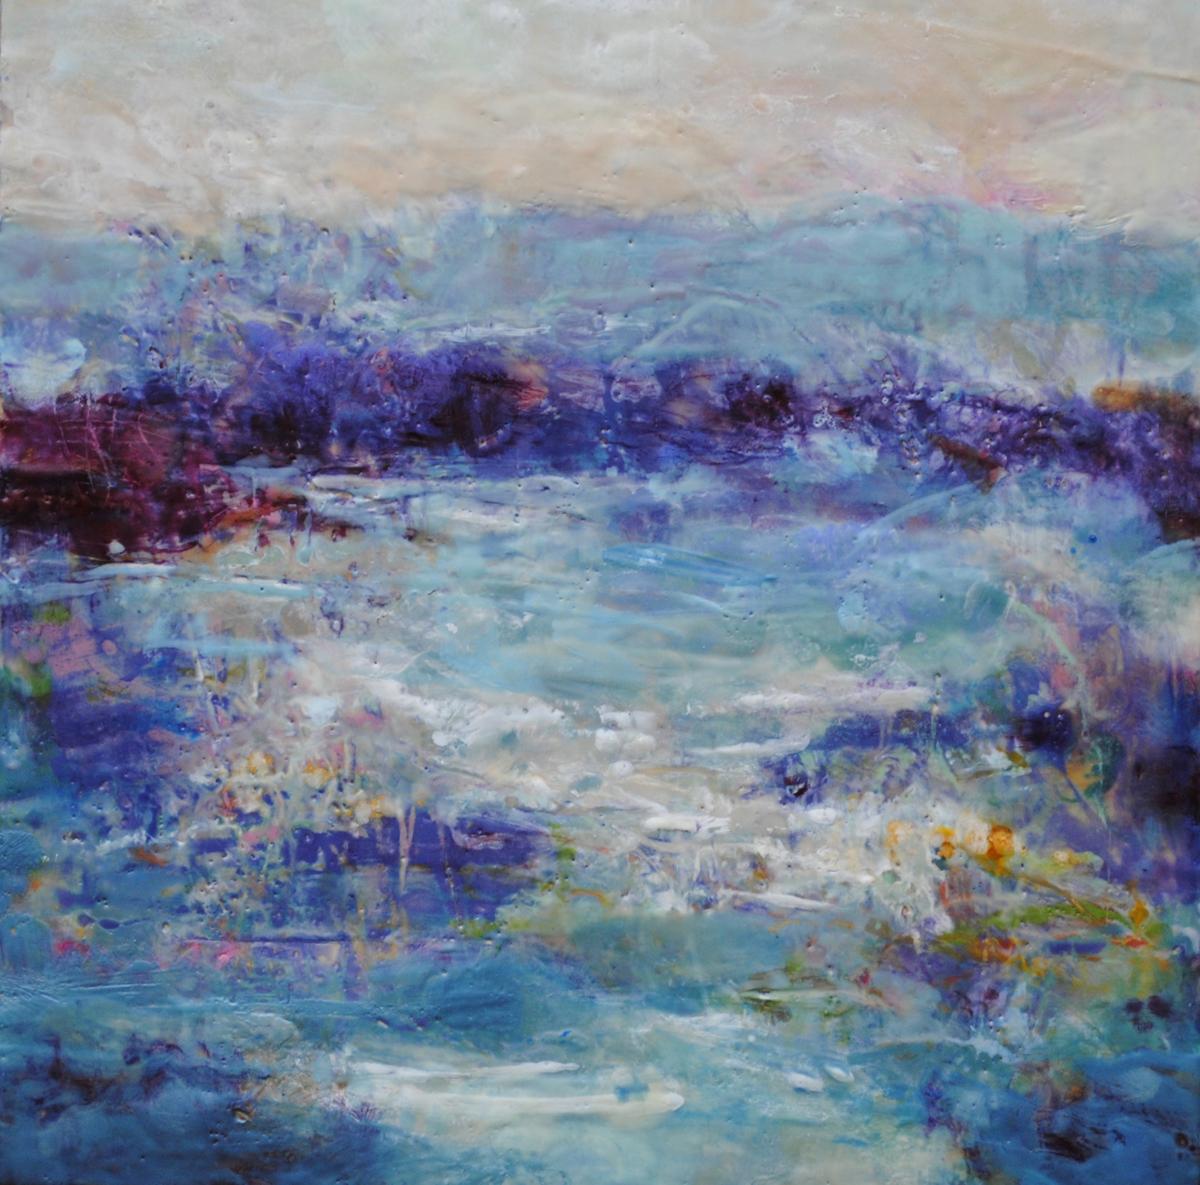 Ocean Blue Sonata (large view)